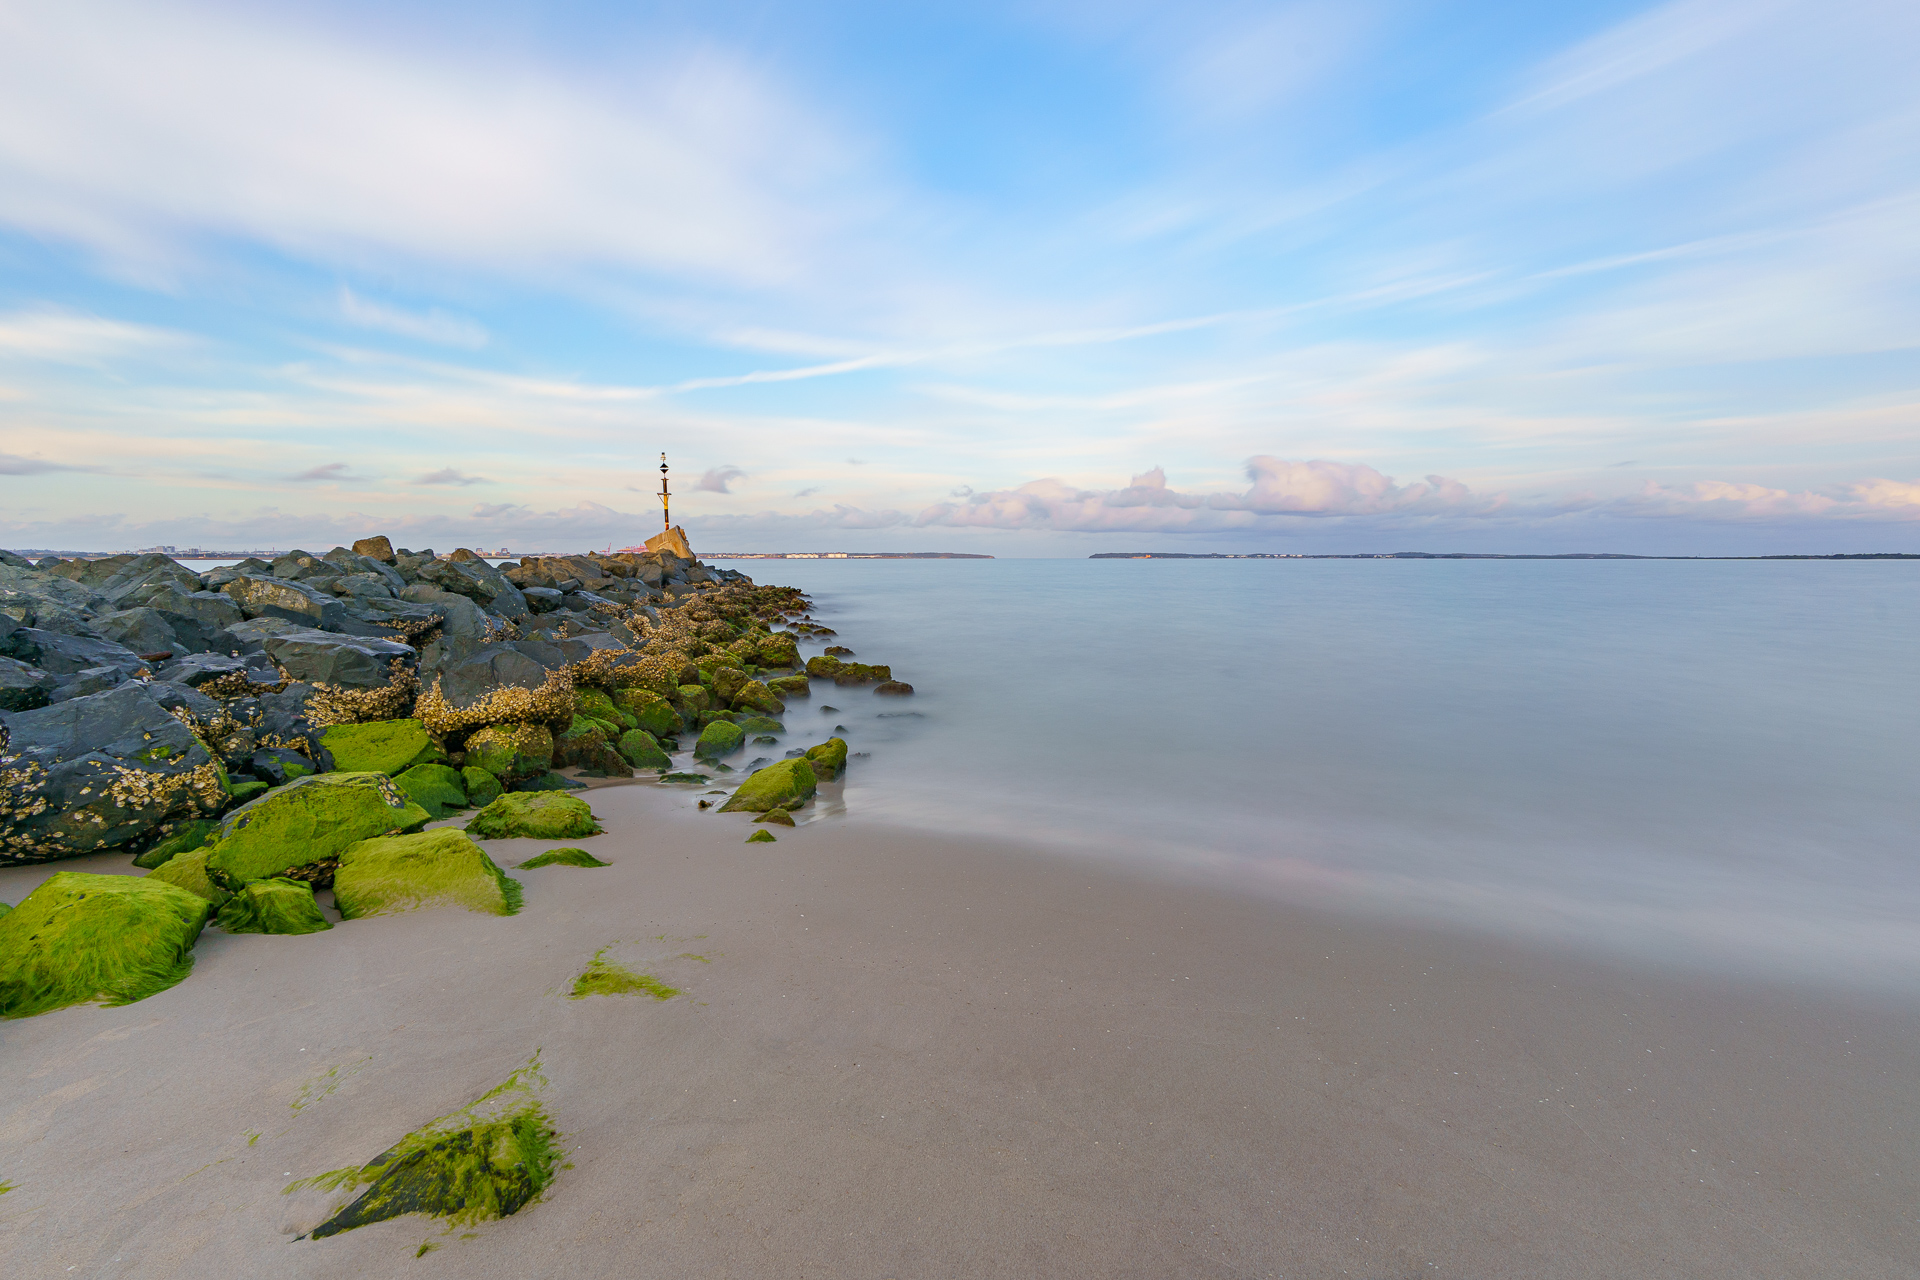 Low Tide in Botany Bay, 4 August 2019.